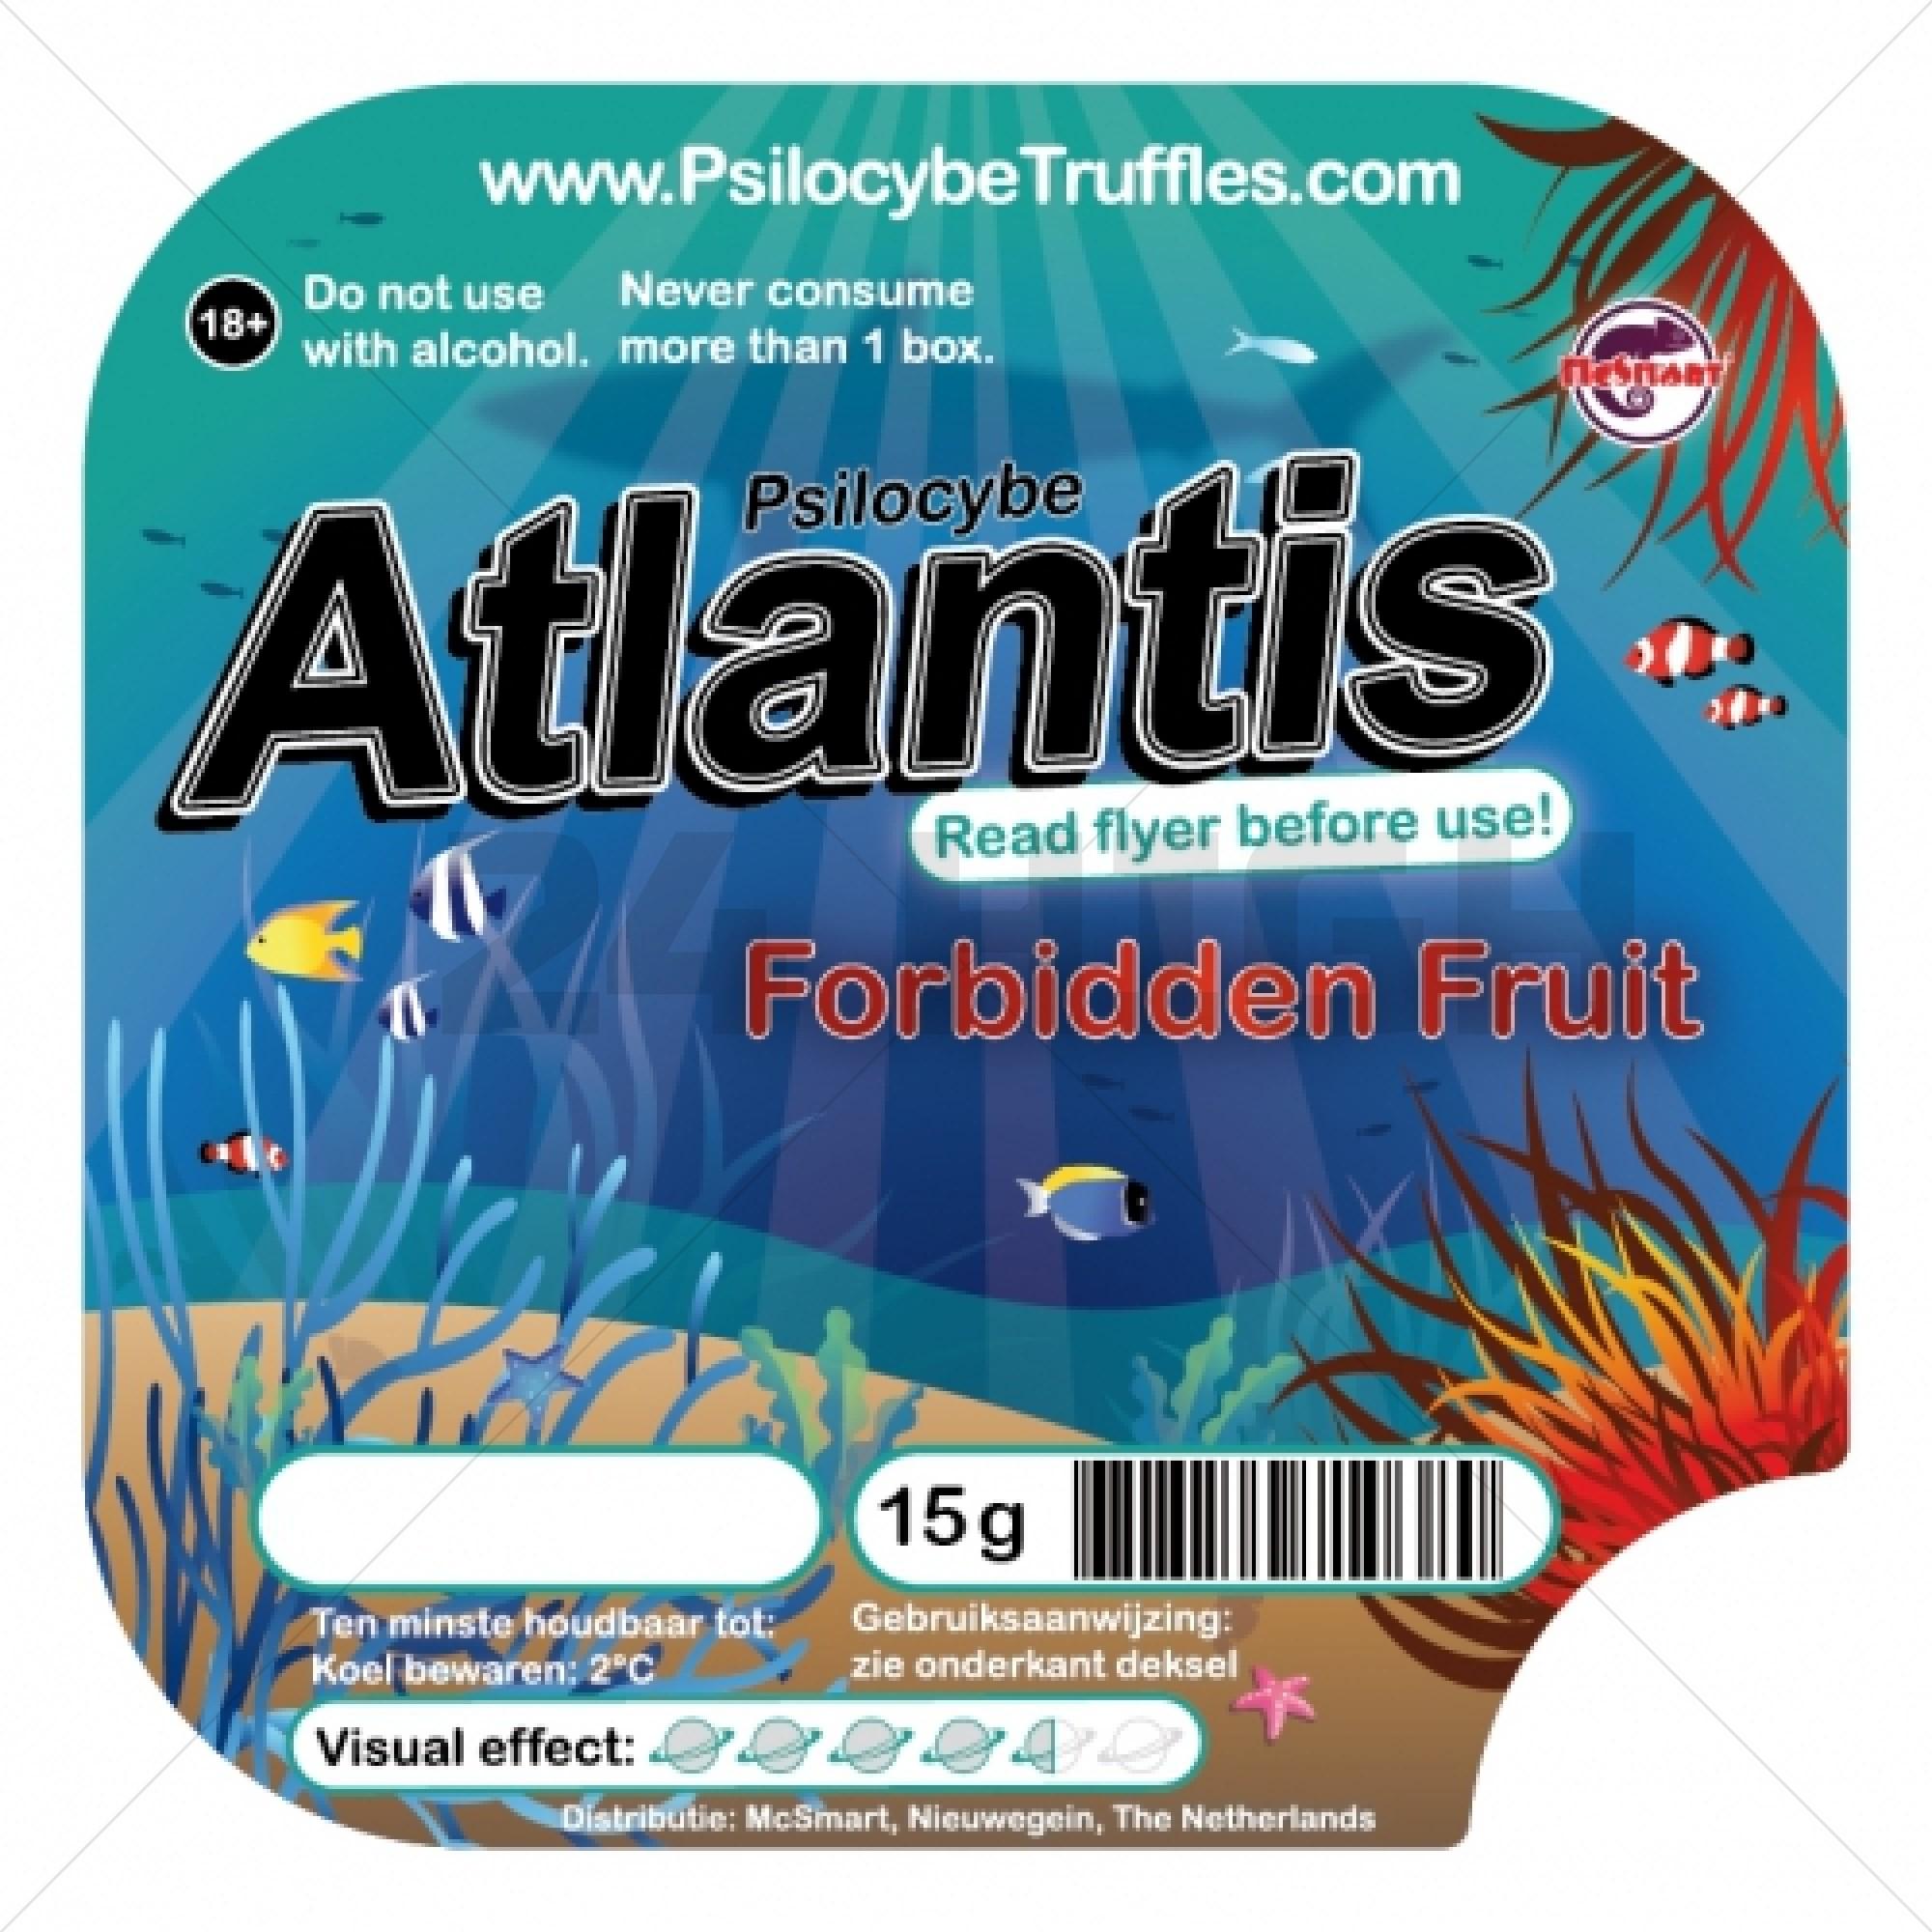 Atlantis Truffles